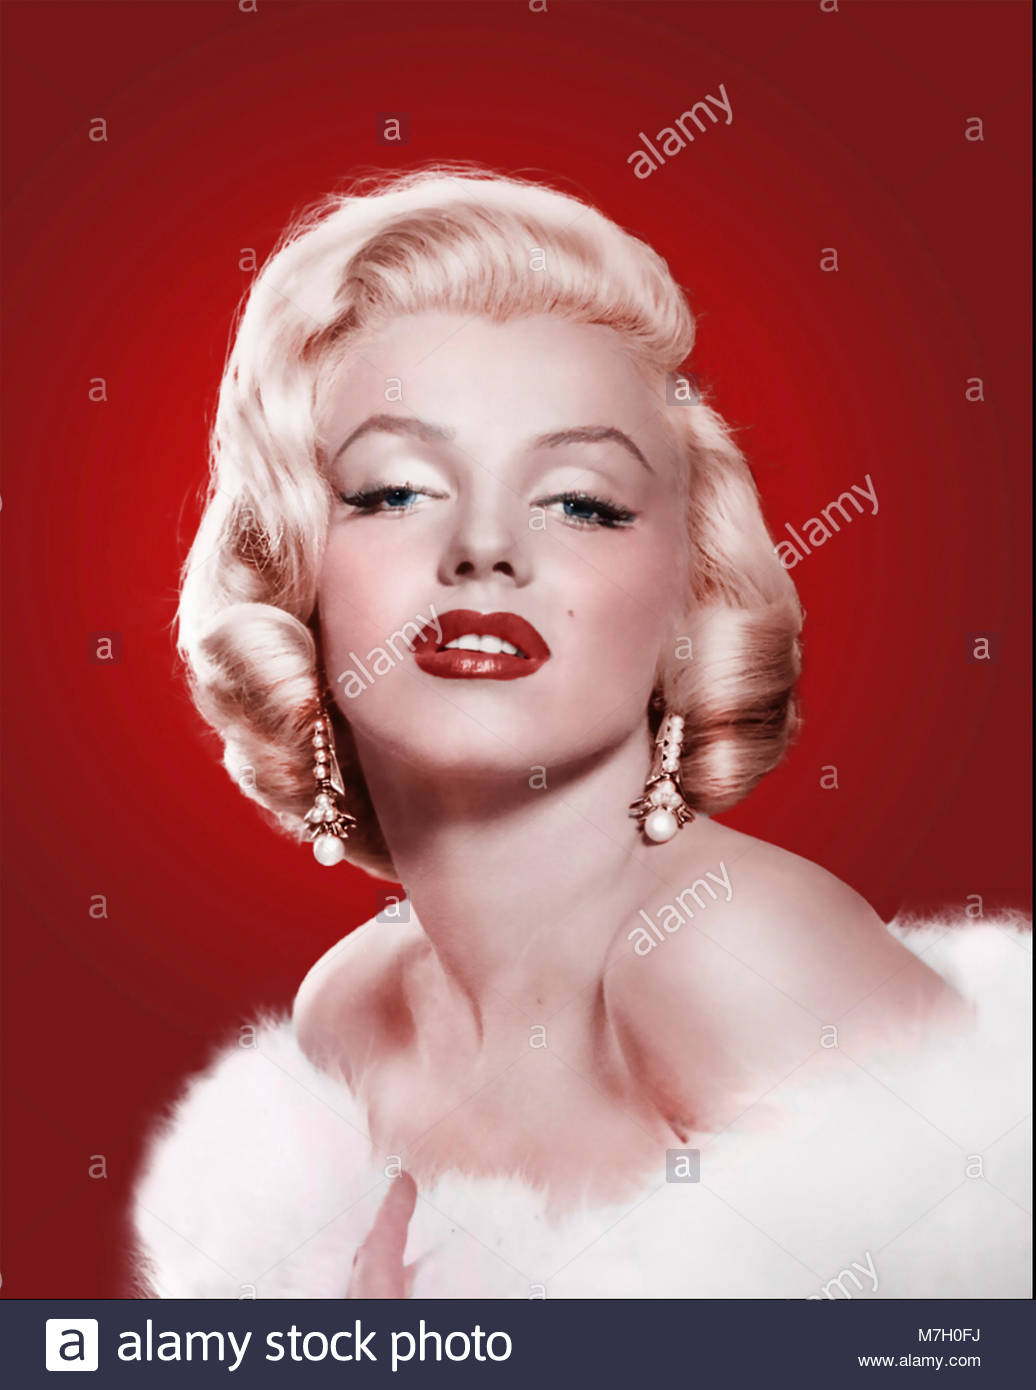 MARILYN MONROE (1926-1962) American film actress in 1953 - Stock Image